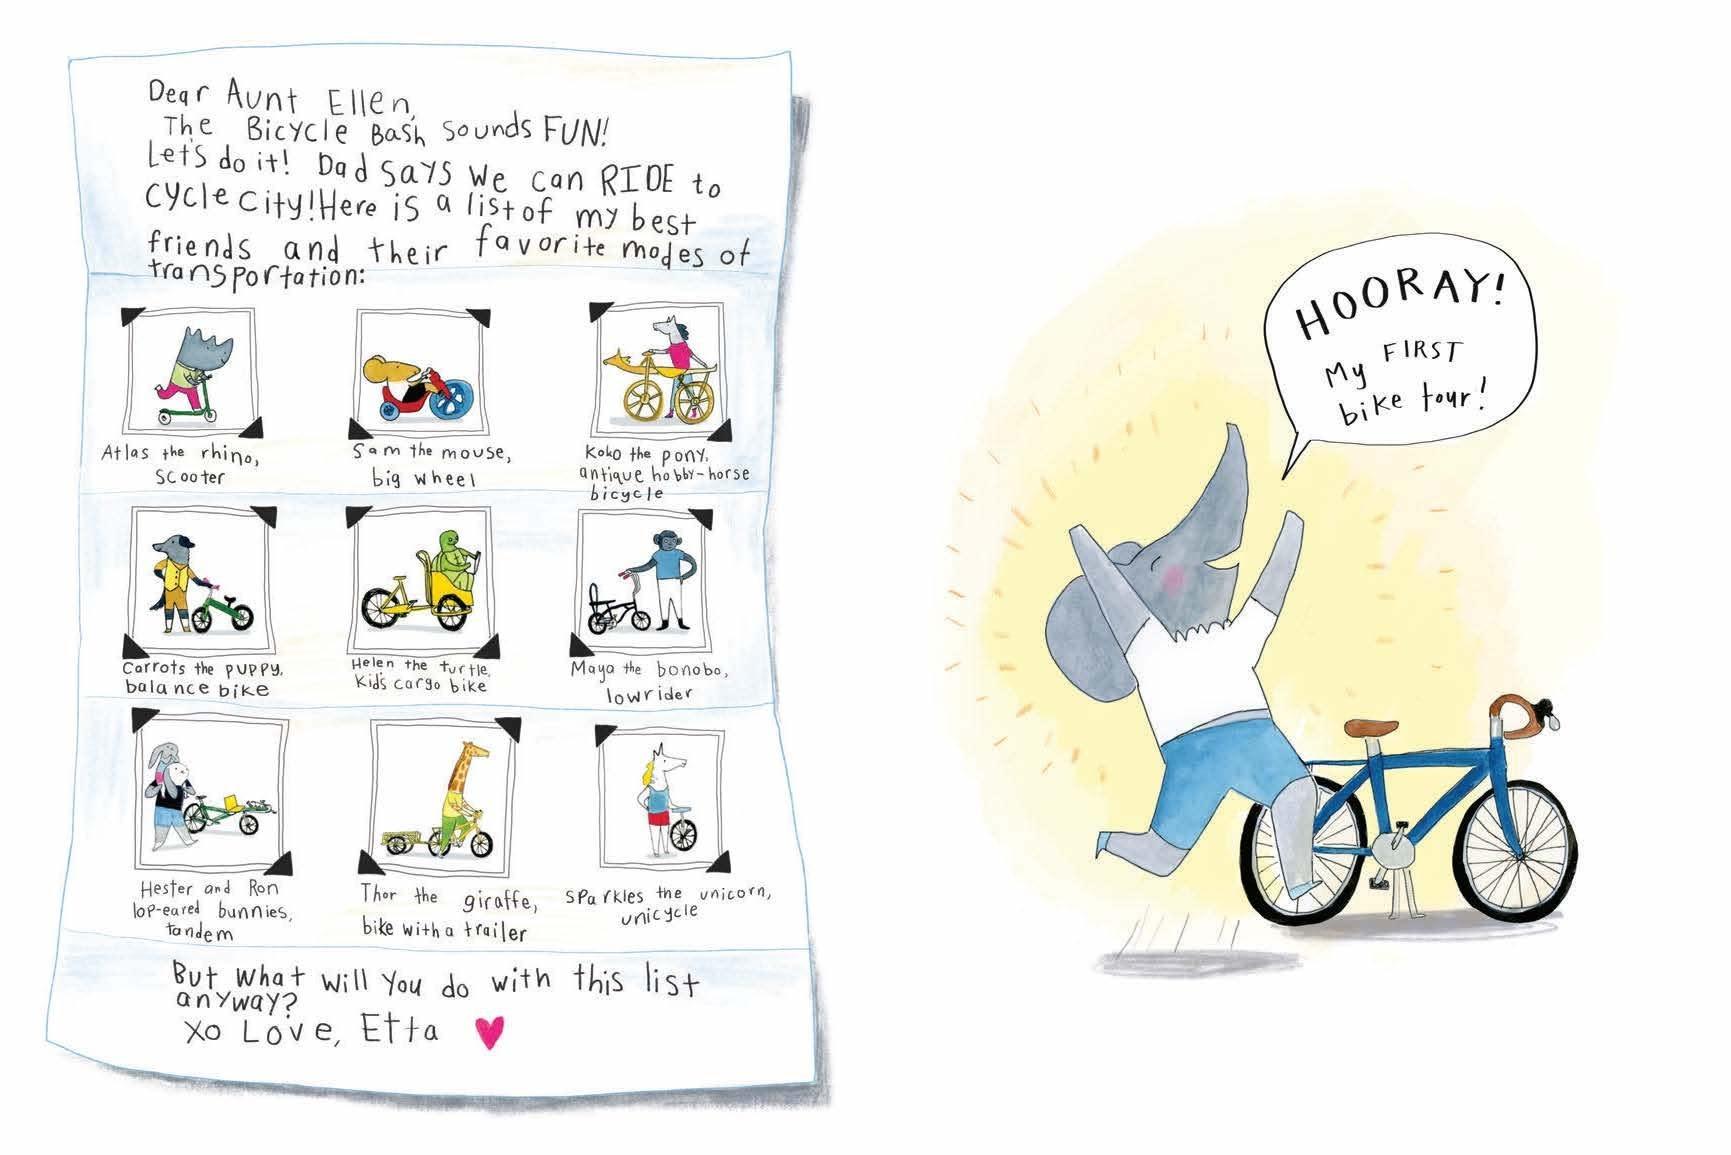 Hachette Bicycle Bash